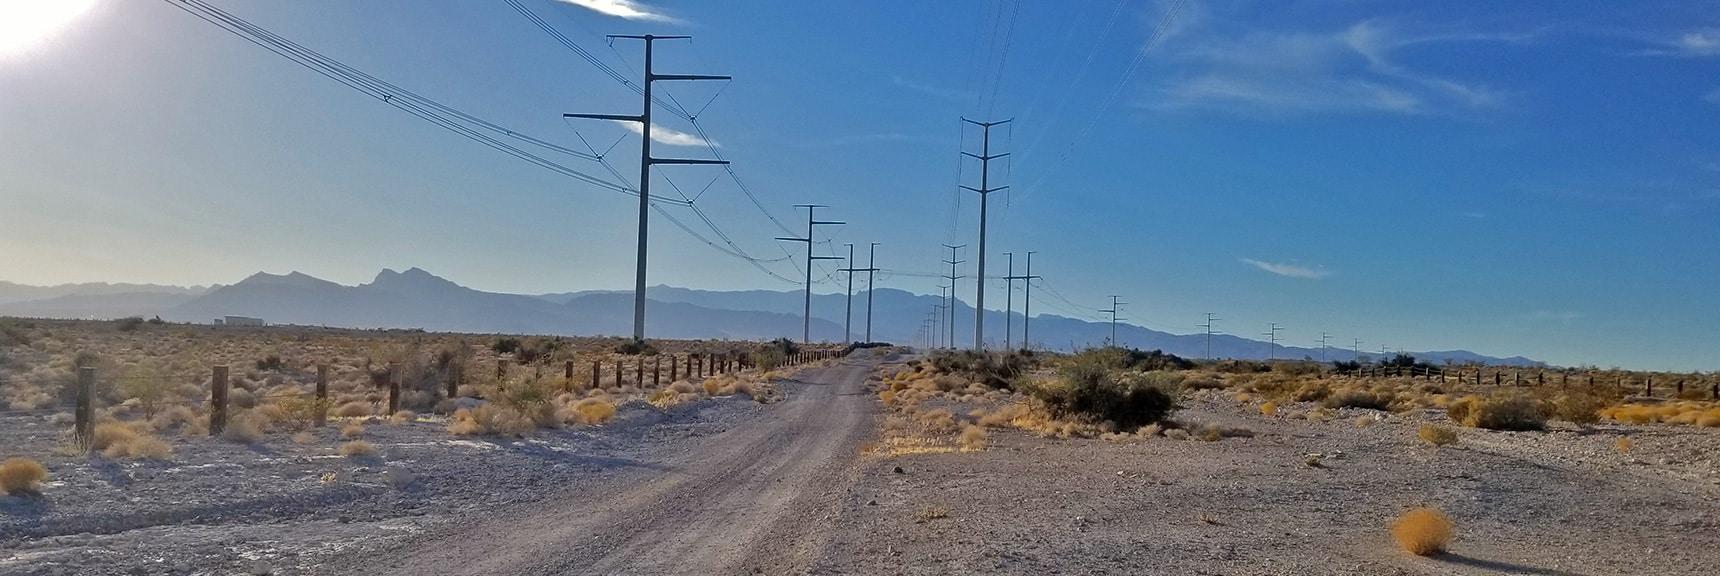 Maintenance Road Along Power LInes. | Gass Peak Road Circuit | Desert National Wildlife Refuge | Nevada